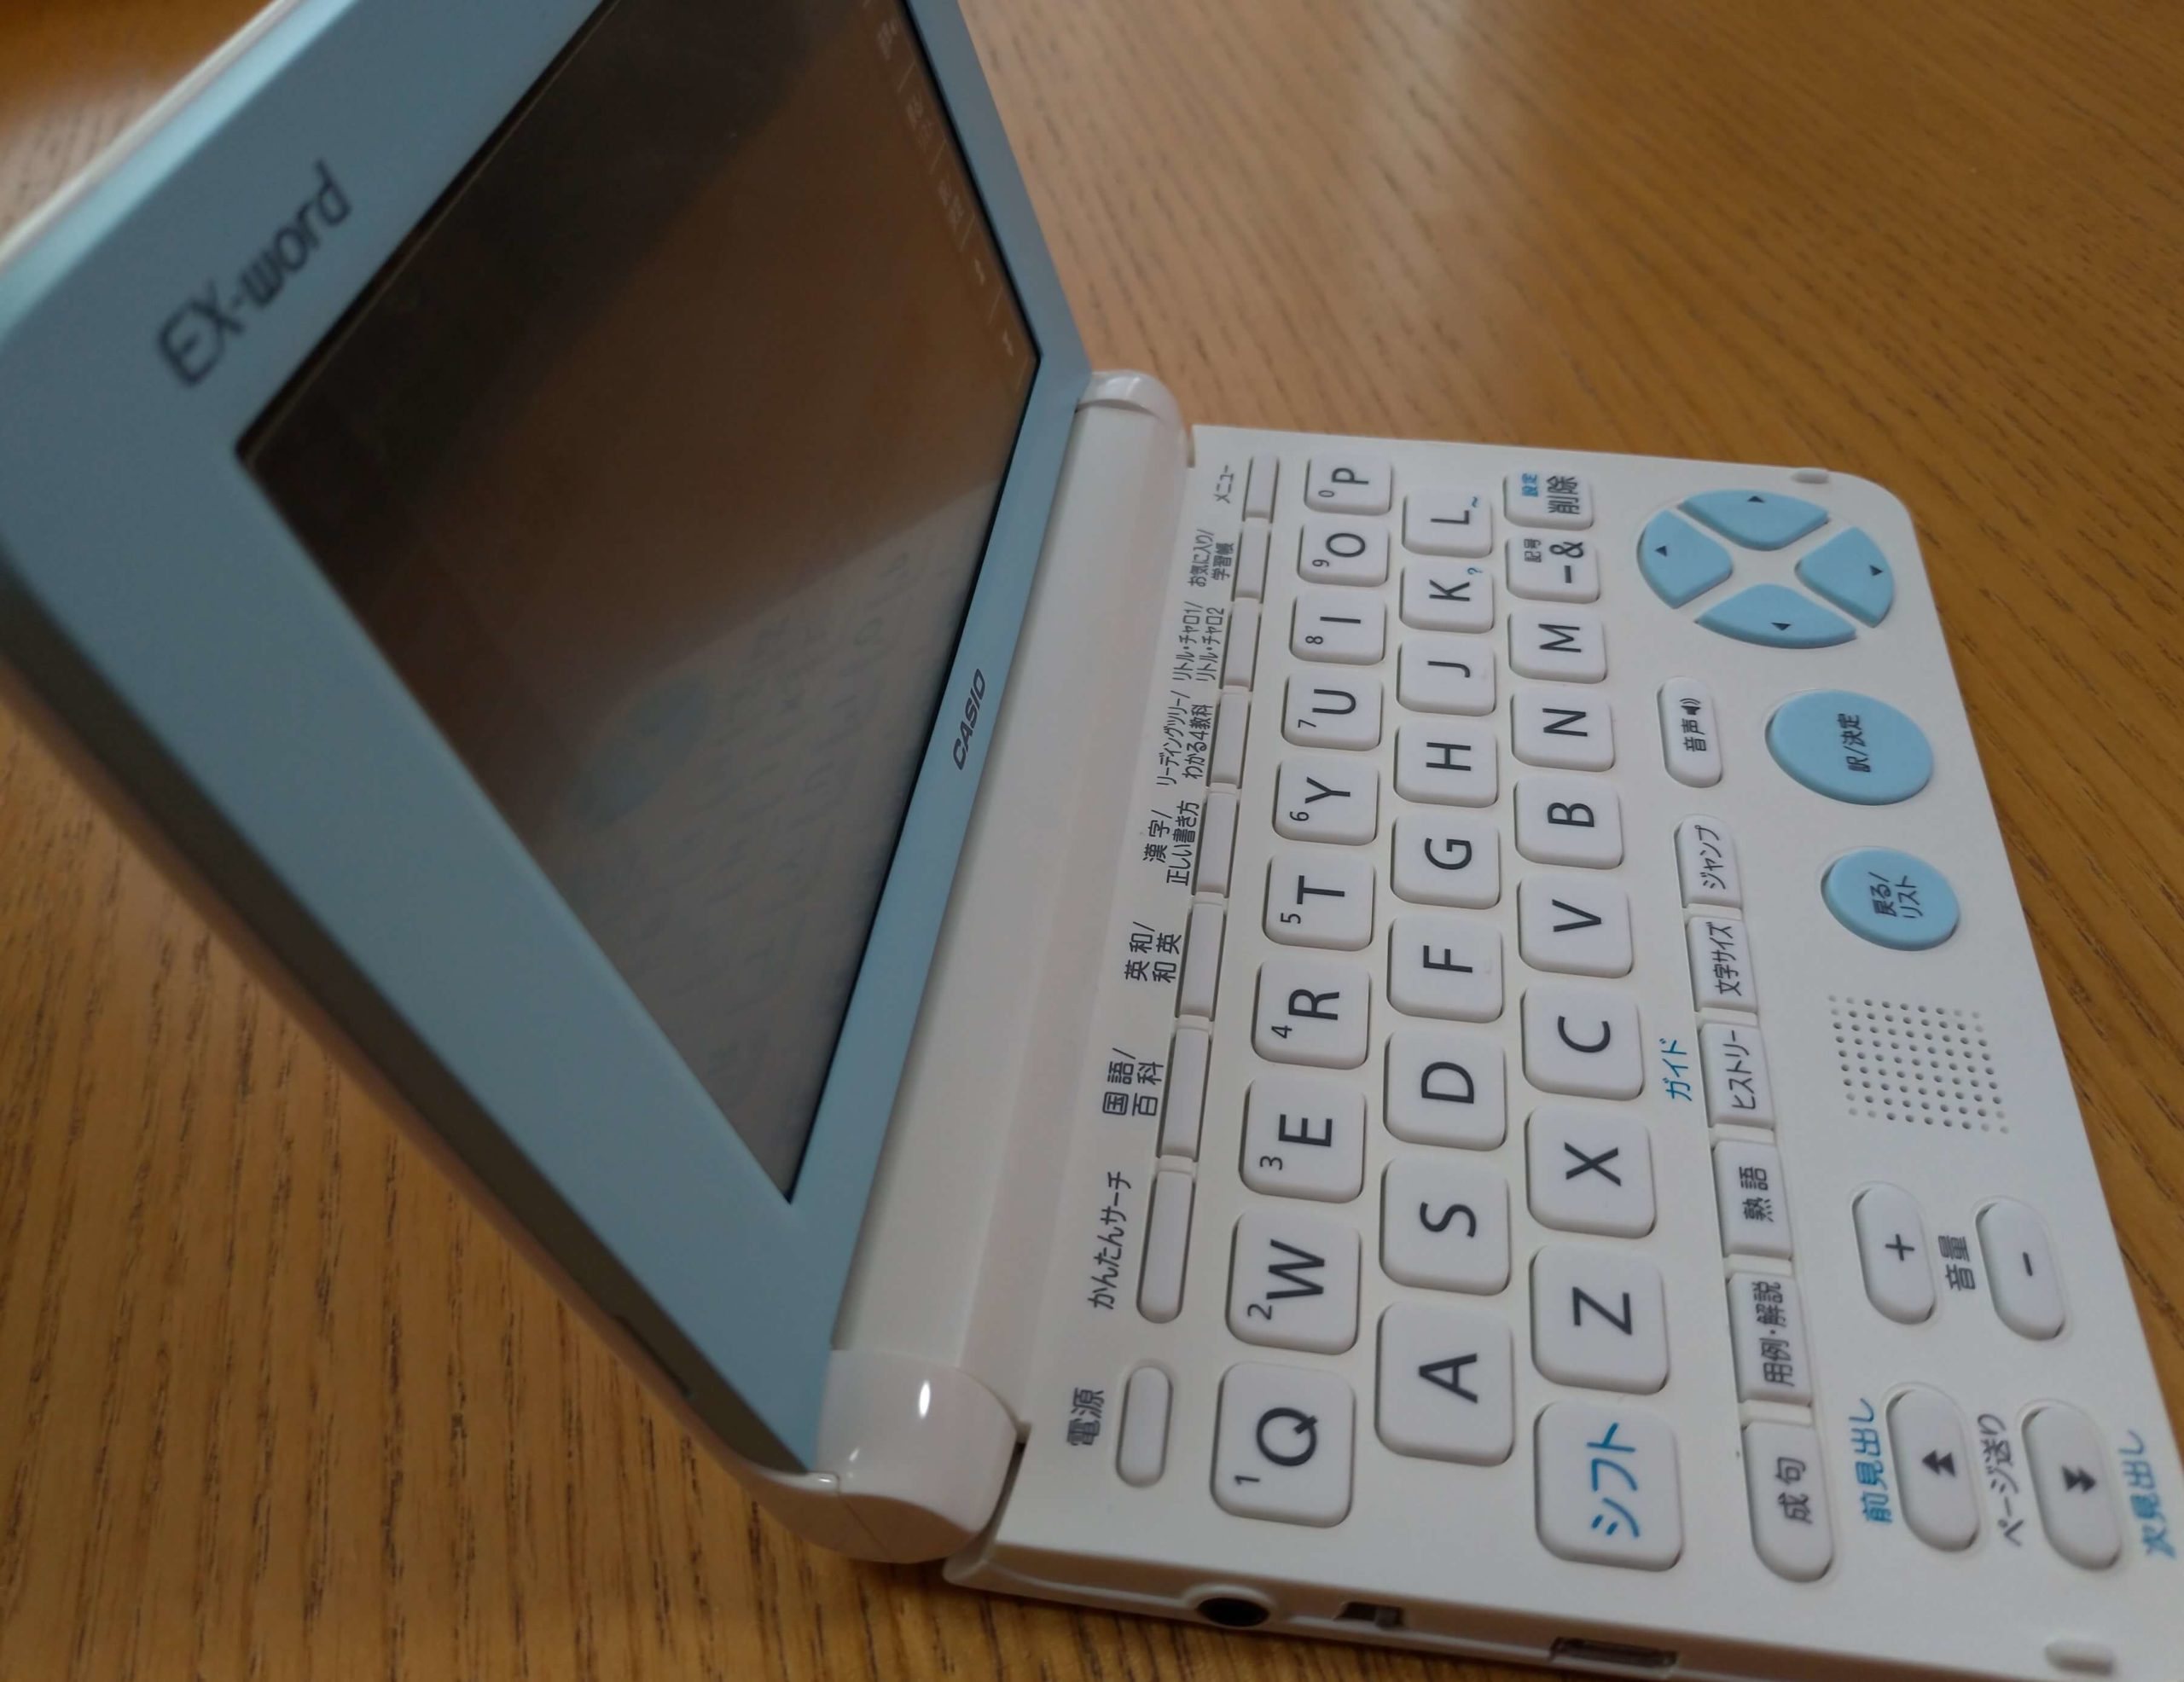 XD-SK2800を開いた画像